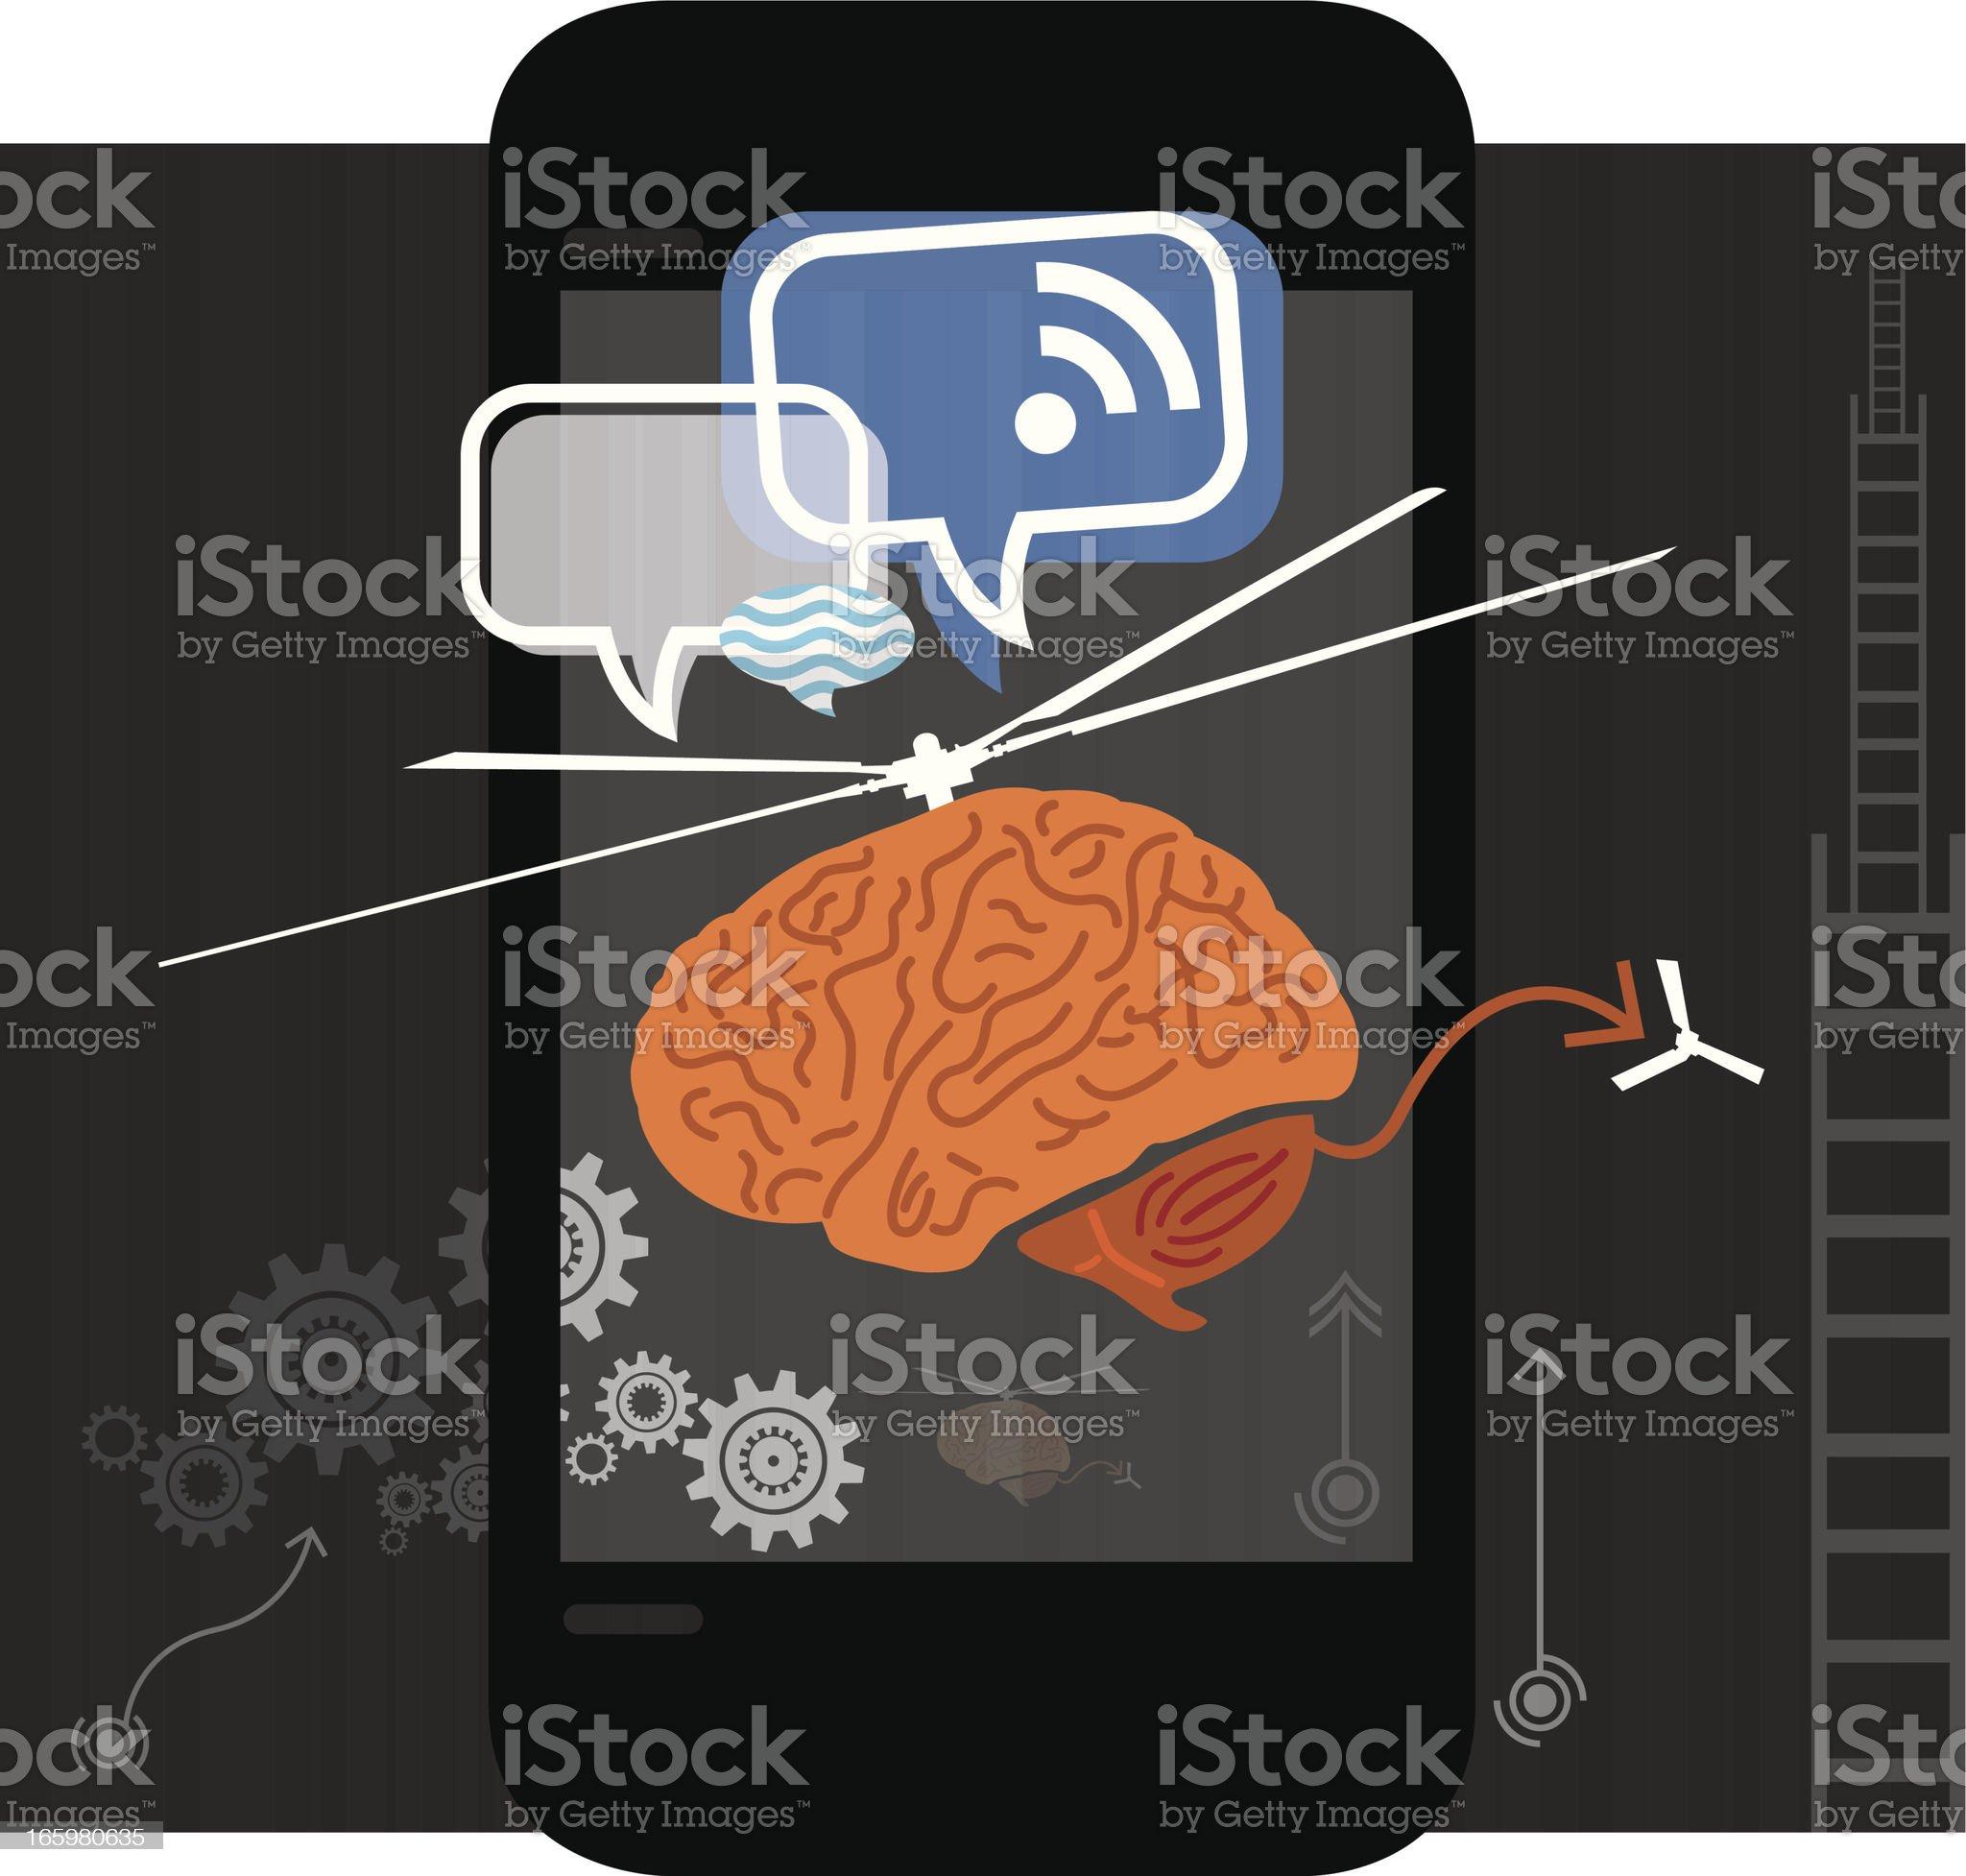 Flying Brain royalty-free stock vector art